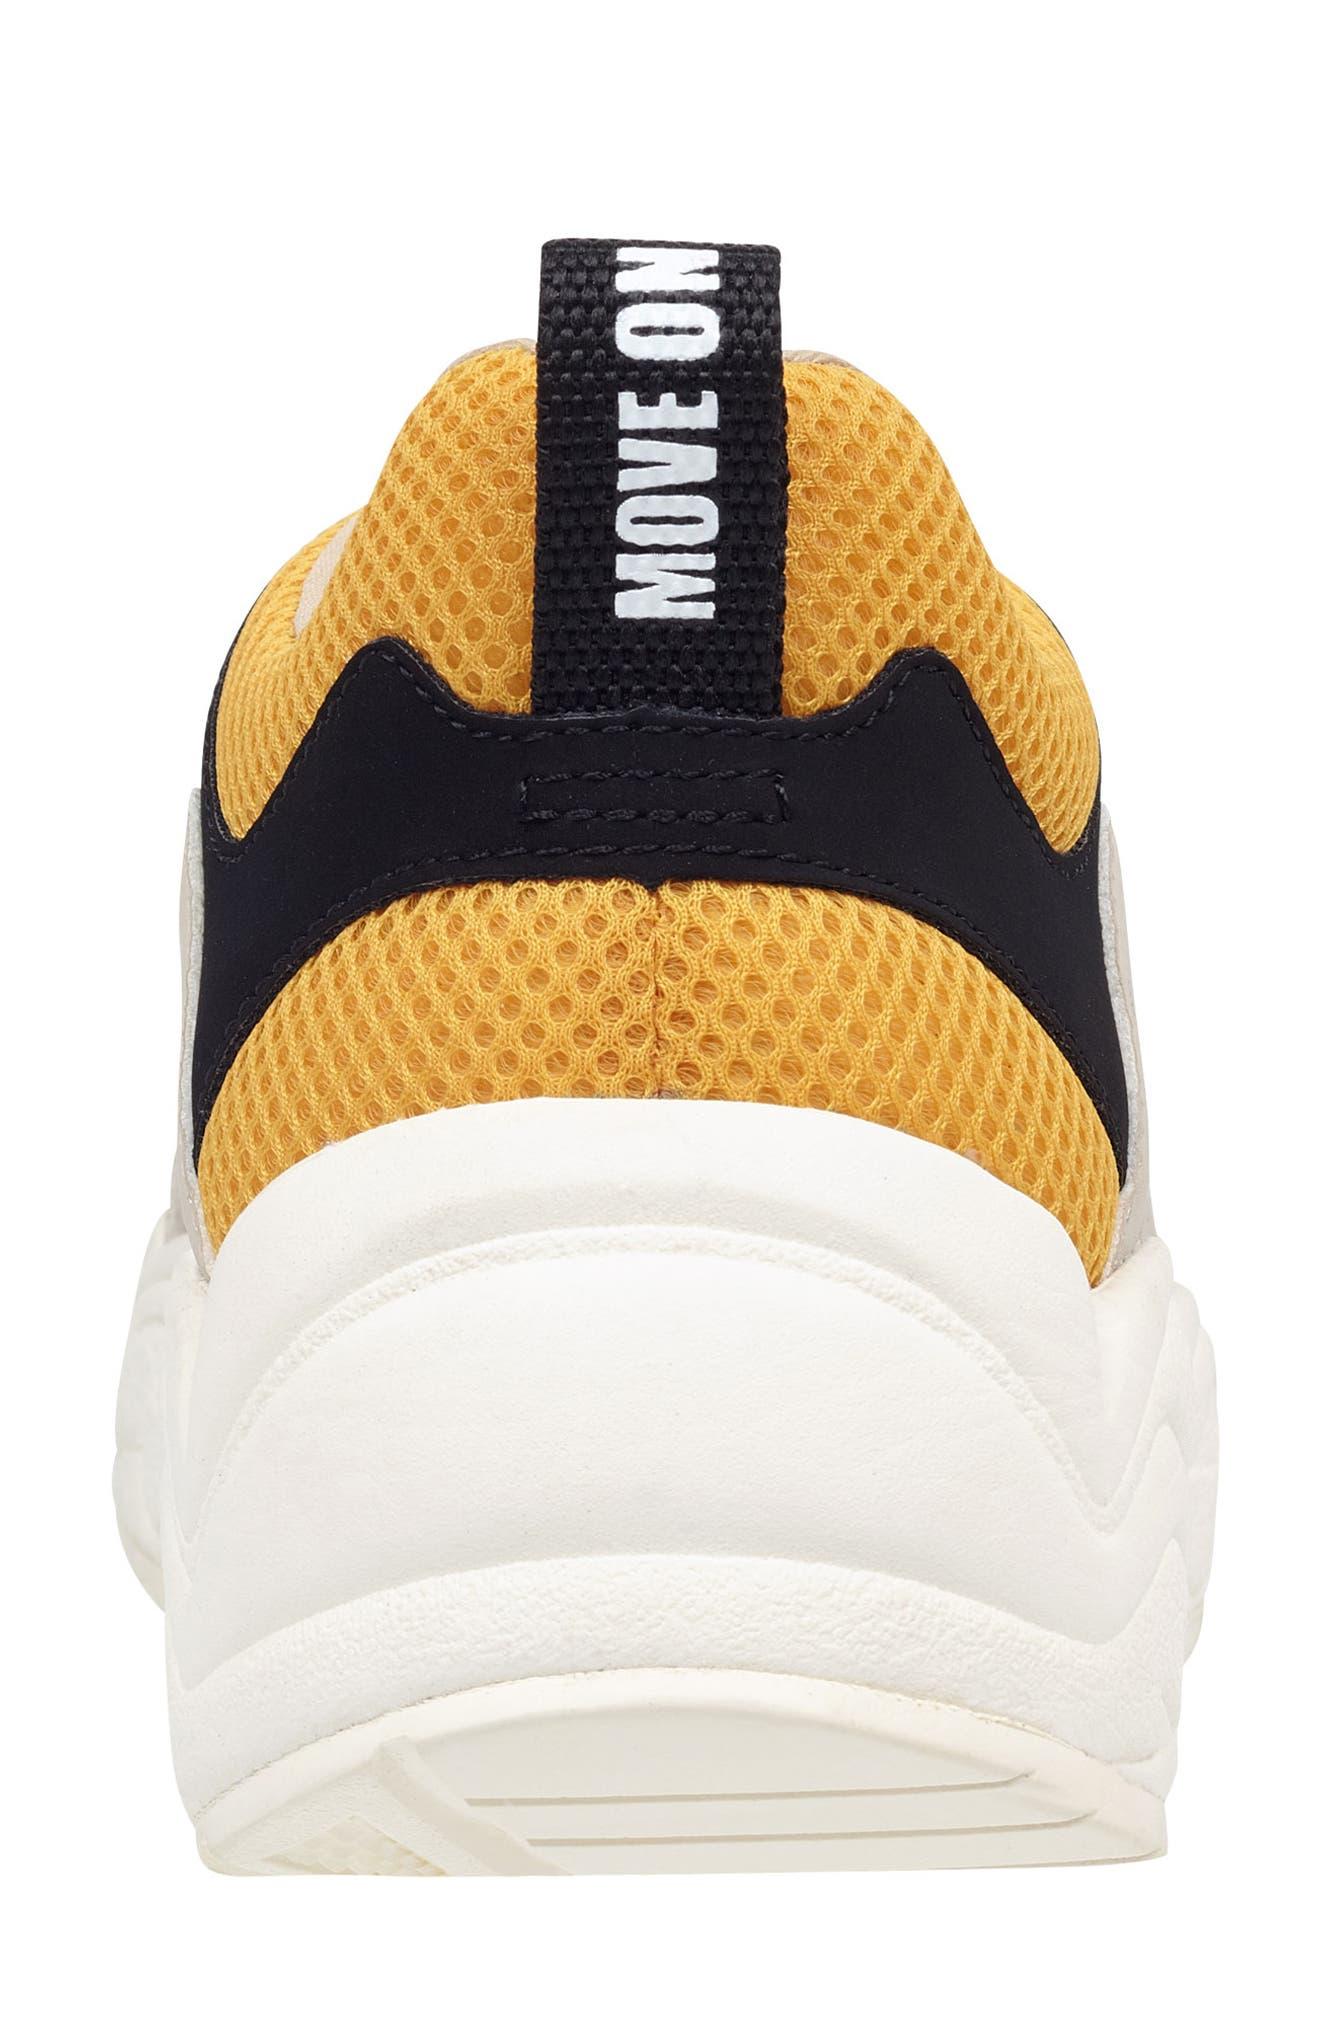 KENDALL + KYLIE,                             Dad Sneaker,                             Alternate thumbnail 7, color,                             250